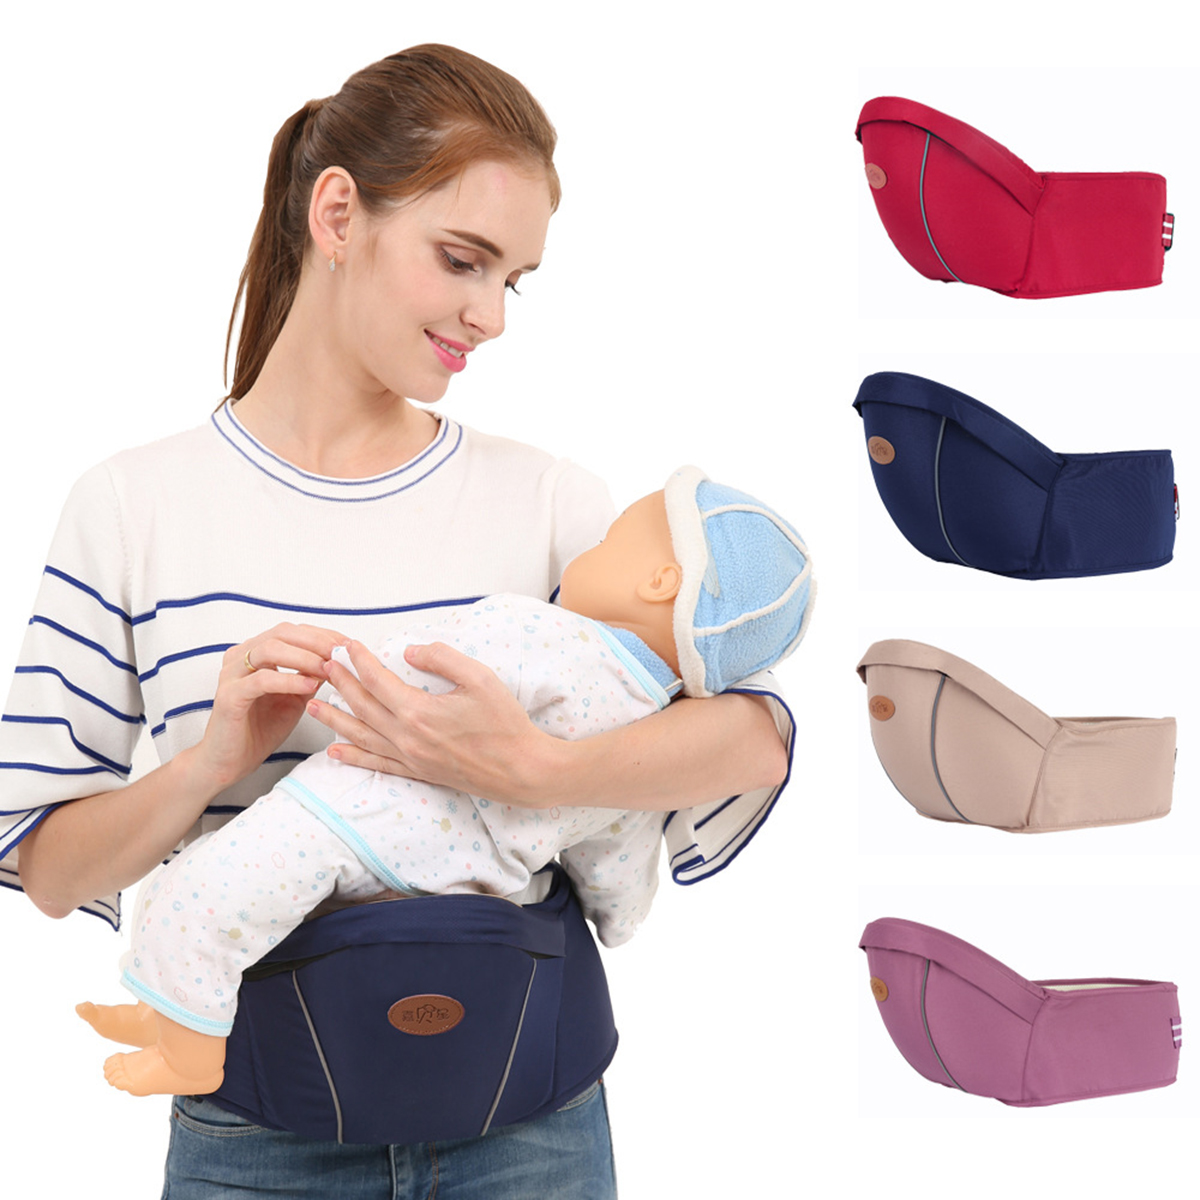 Baby Hip Seat Carrier Waist Stool Walkers Hold Waist Belt Backpack Carrier Kids Infant Comfort Hip Seat Waist Seat